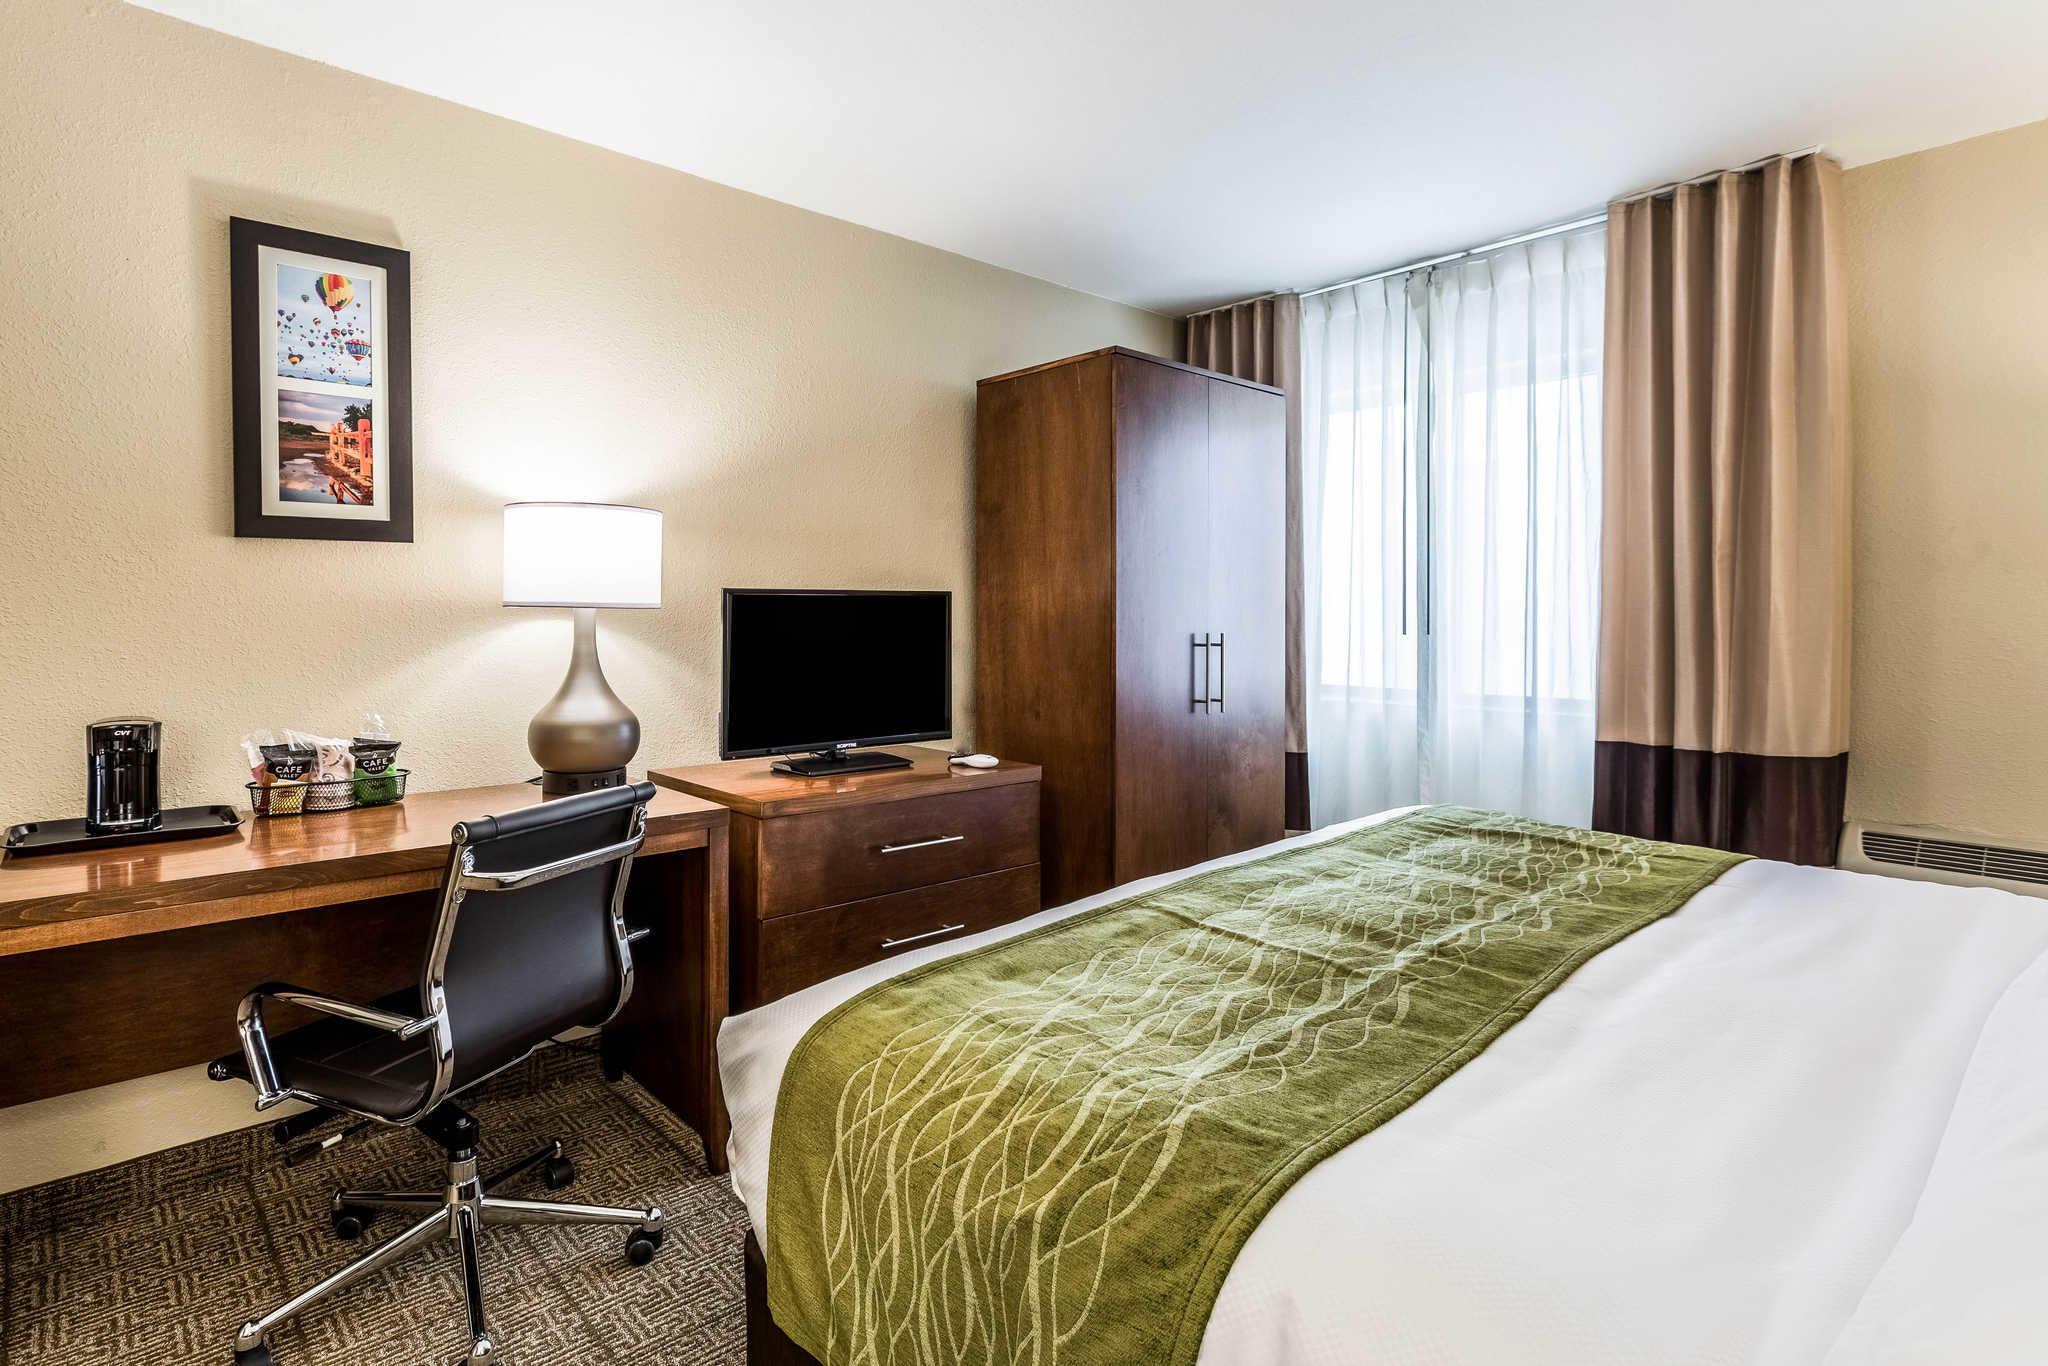 Comfort Inn & Suites Albuquerque Downtown image 8